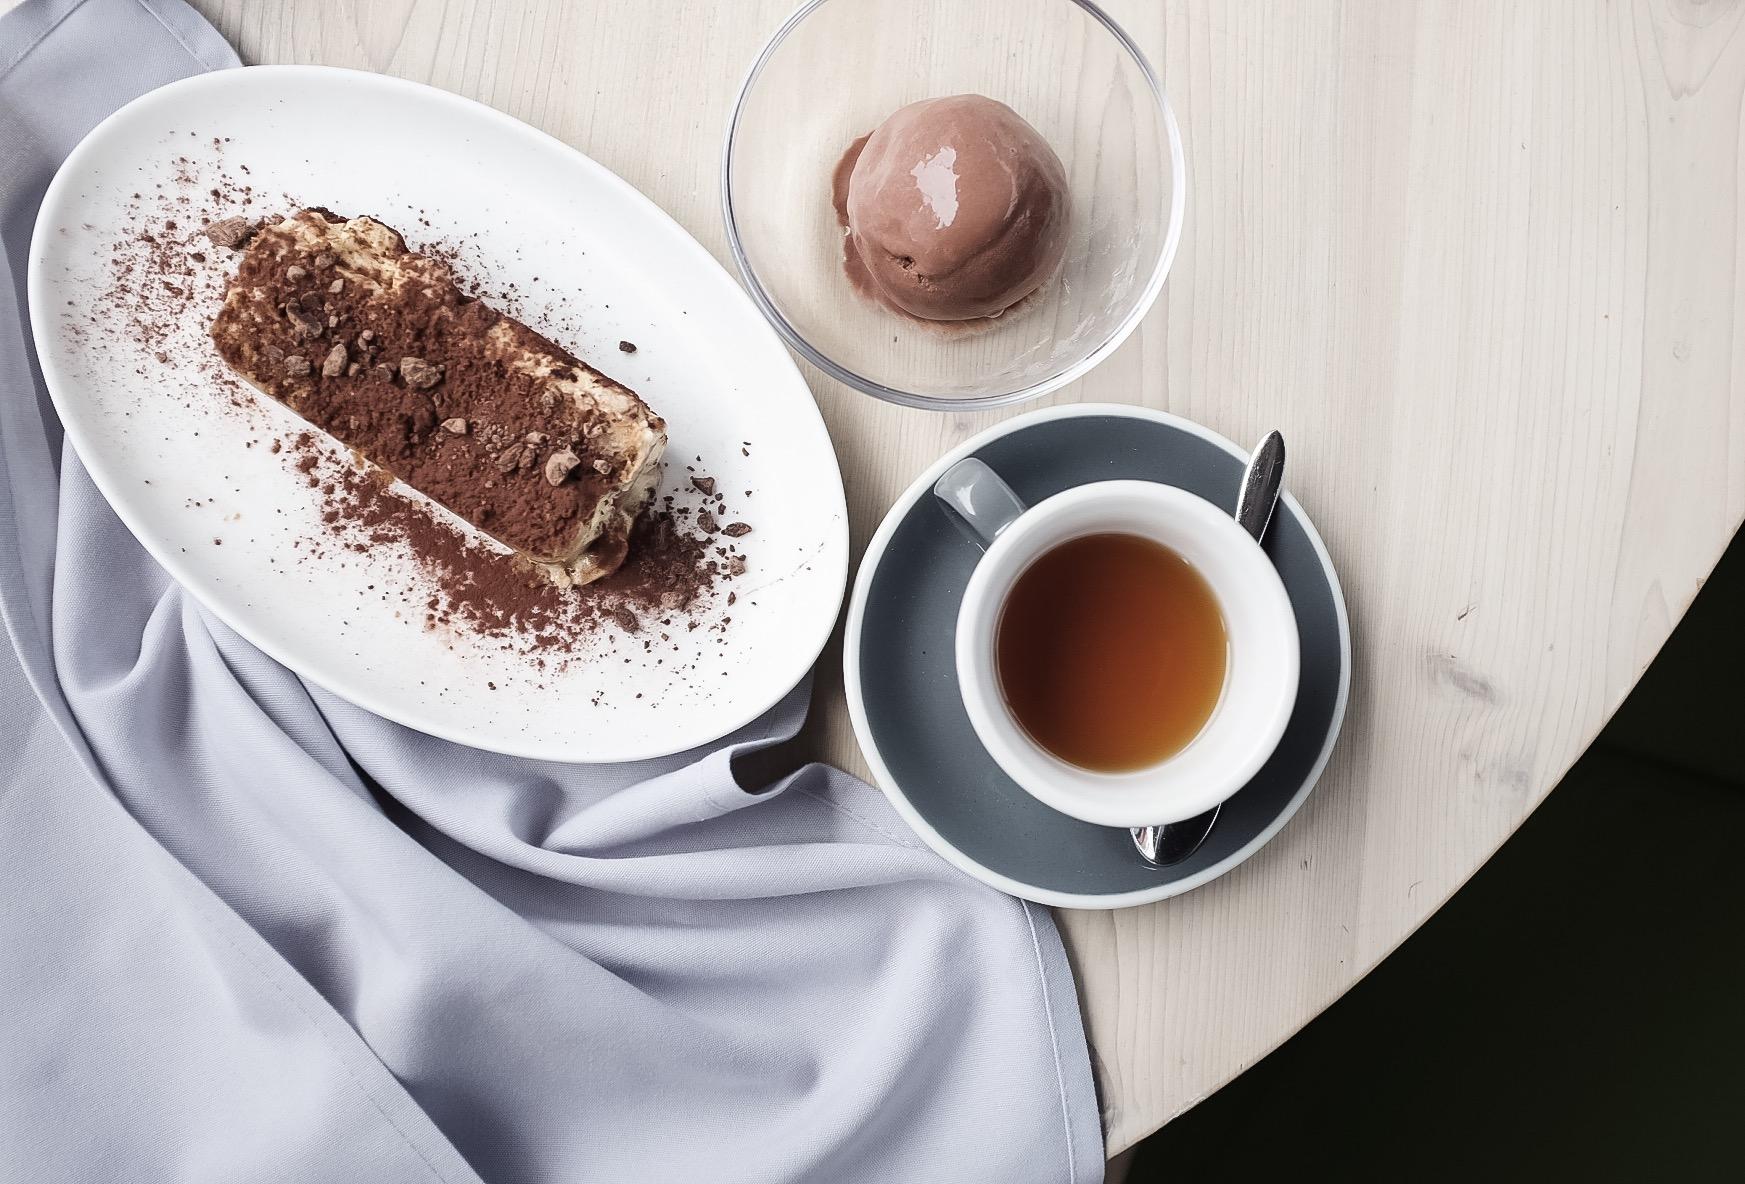 Tasty tiramisu for dessert.